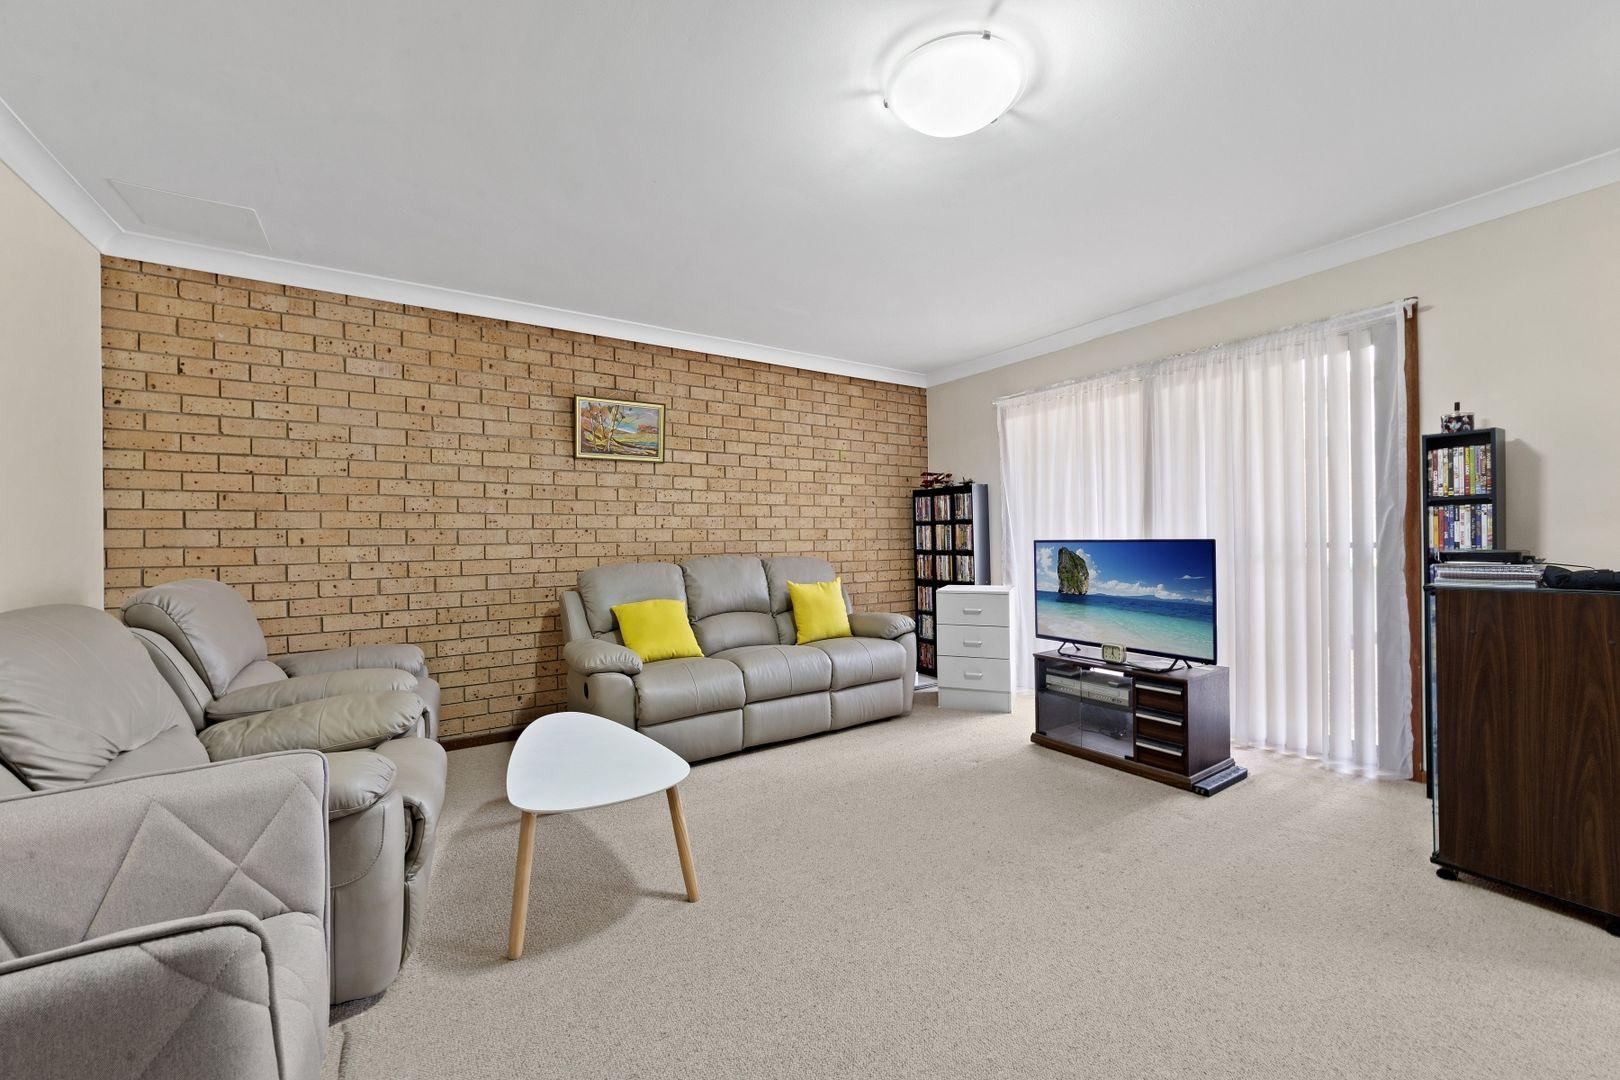 2/322 Trafalgar Ave, Umina Beach NSW 2257, Image 1